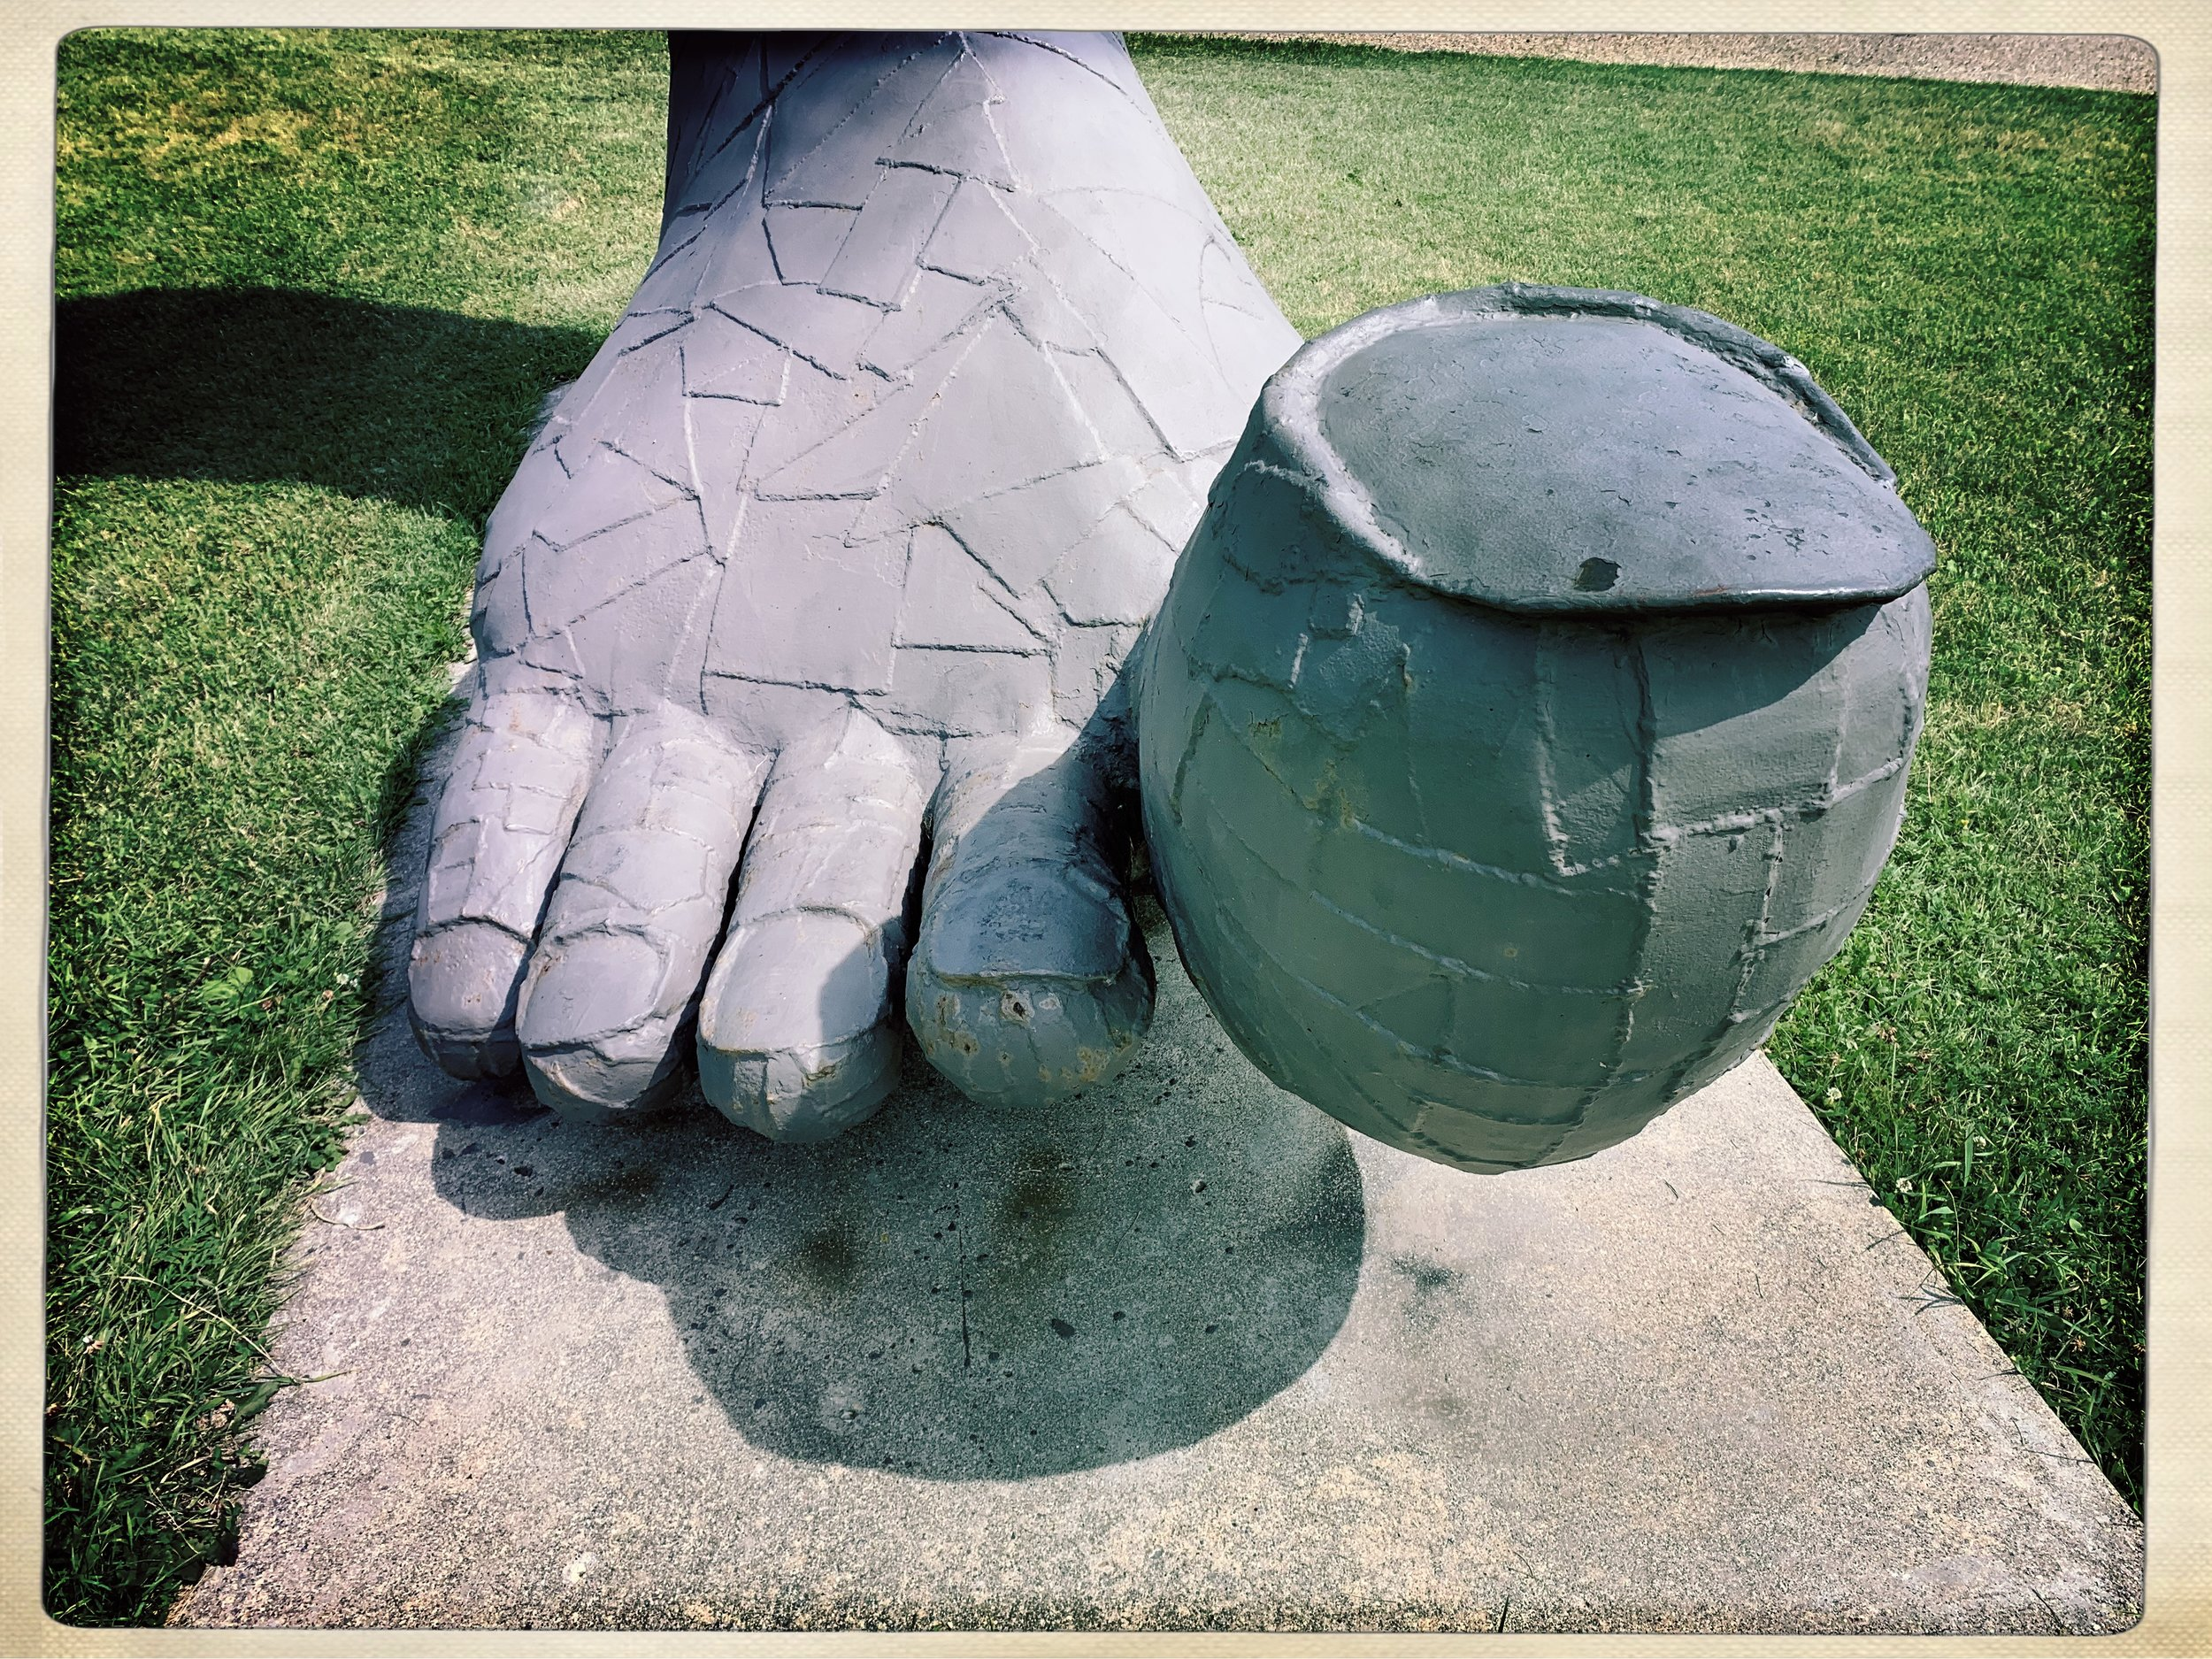 Big Foot sculpture by Ken Nyberg in Vining, Minnesota